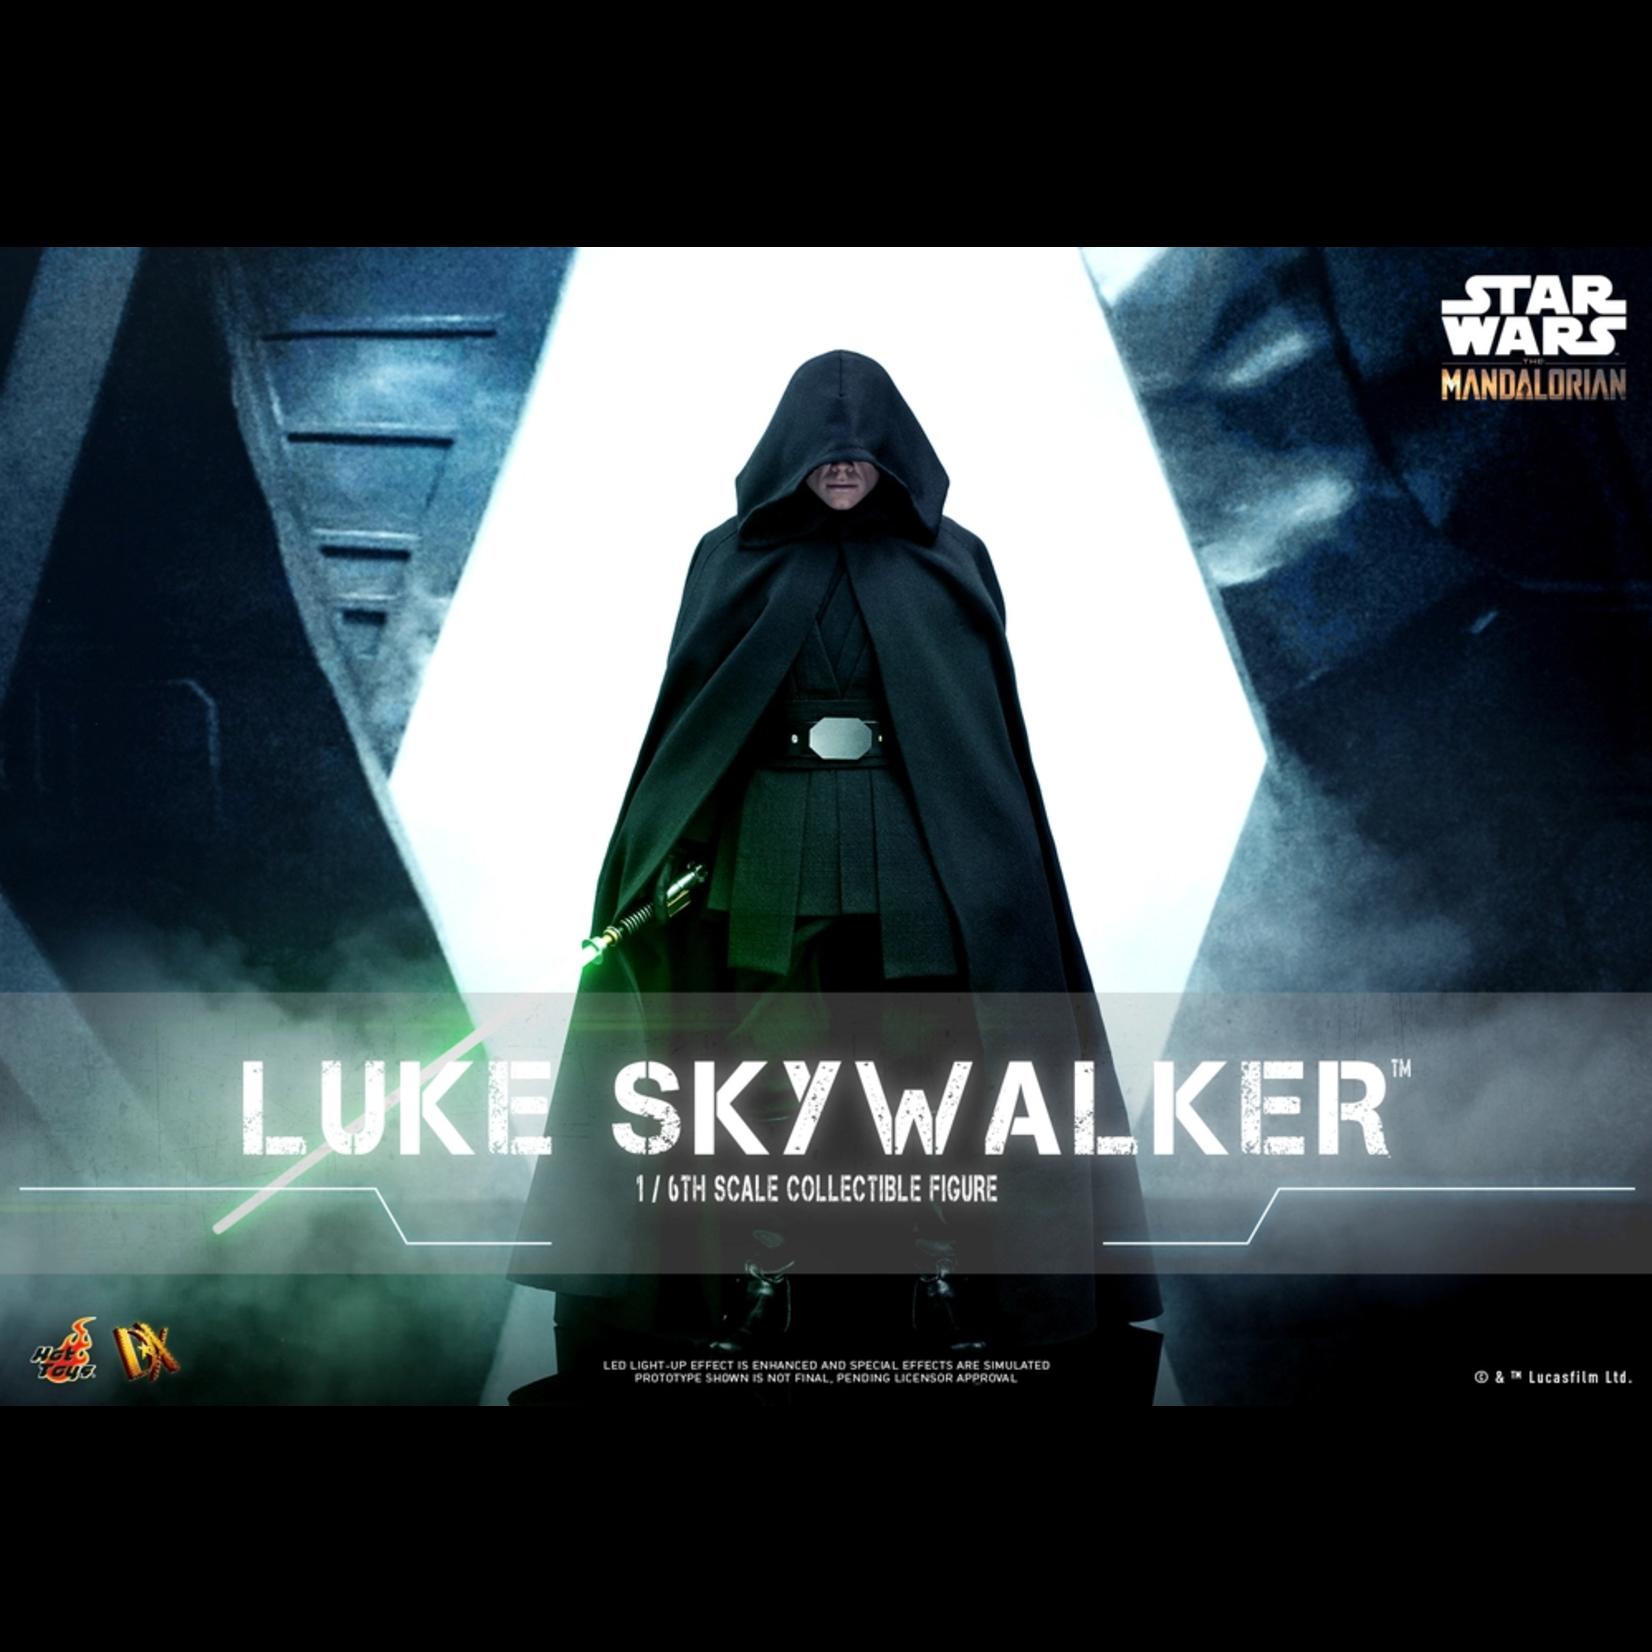 Hot Toys [Preorder] Hot Toys DX22 Star Wars: The Mandalorian™ Luke Skywalker